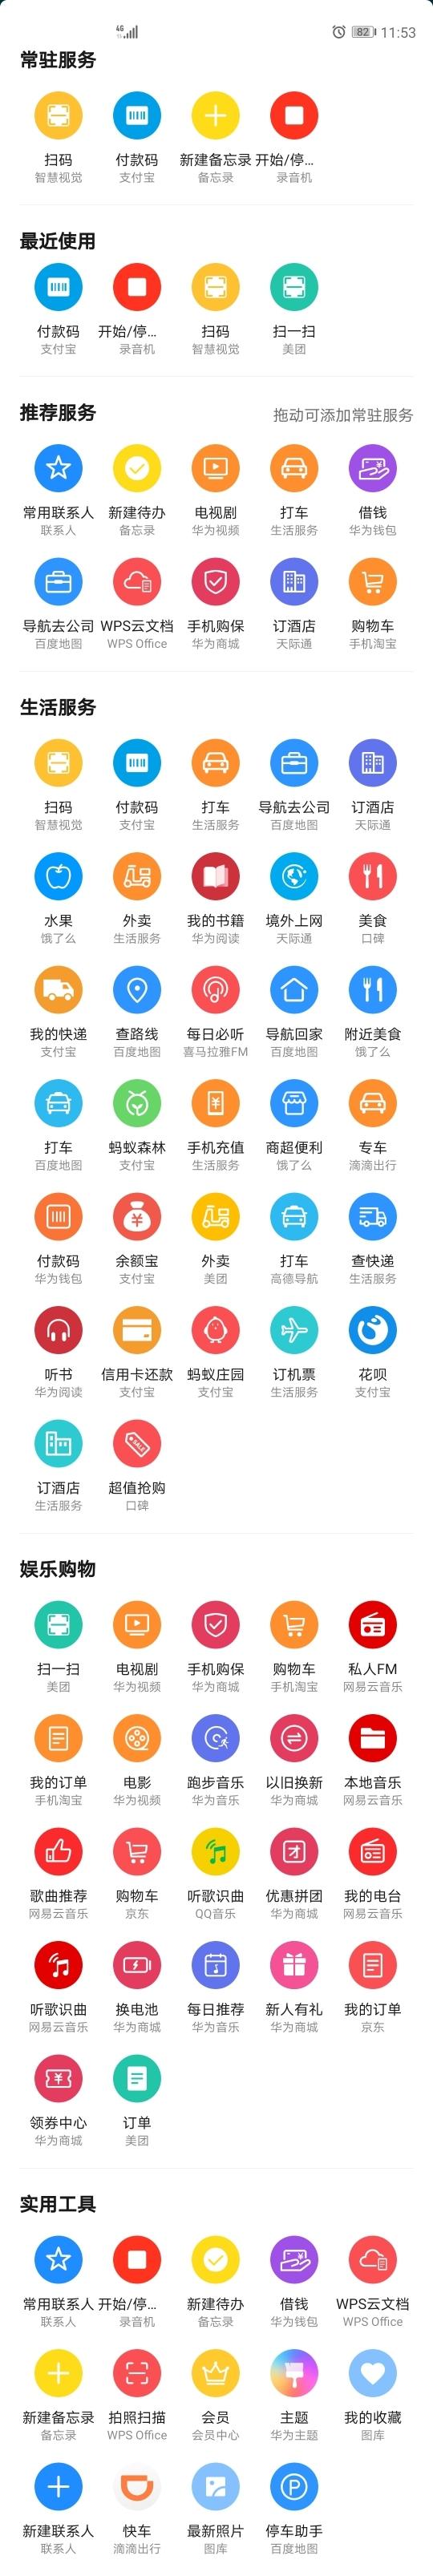 Screenshot_20200119_115321_com.huawei.intelligent.jpg